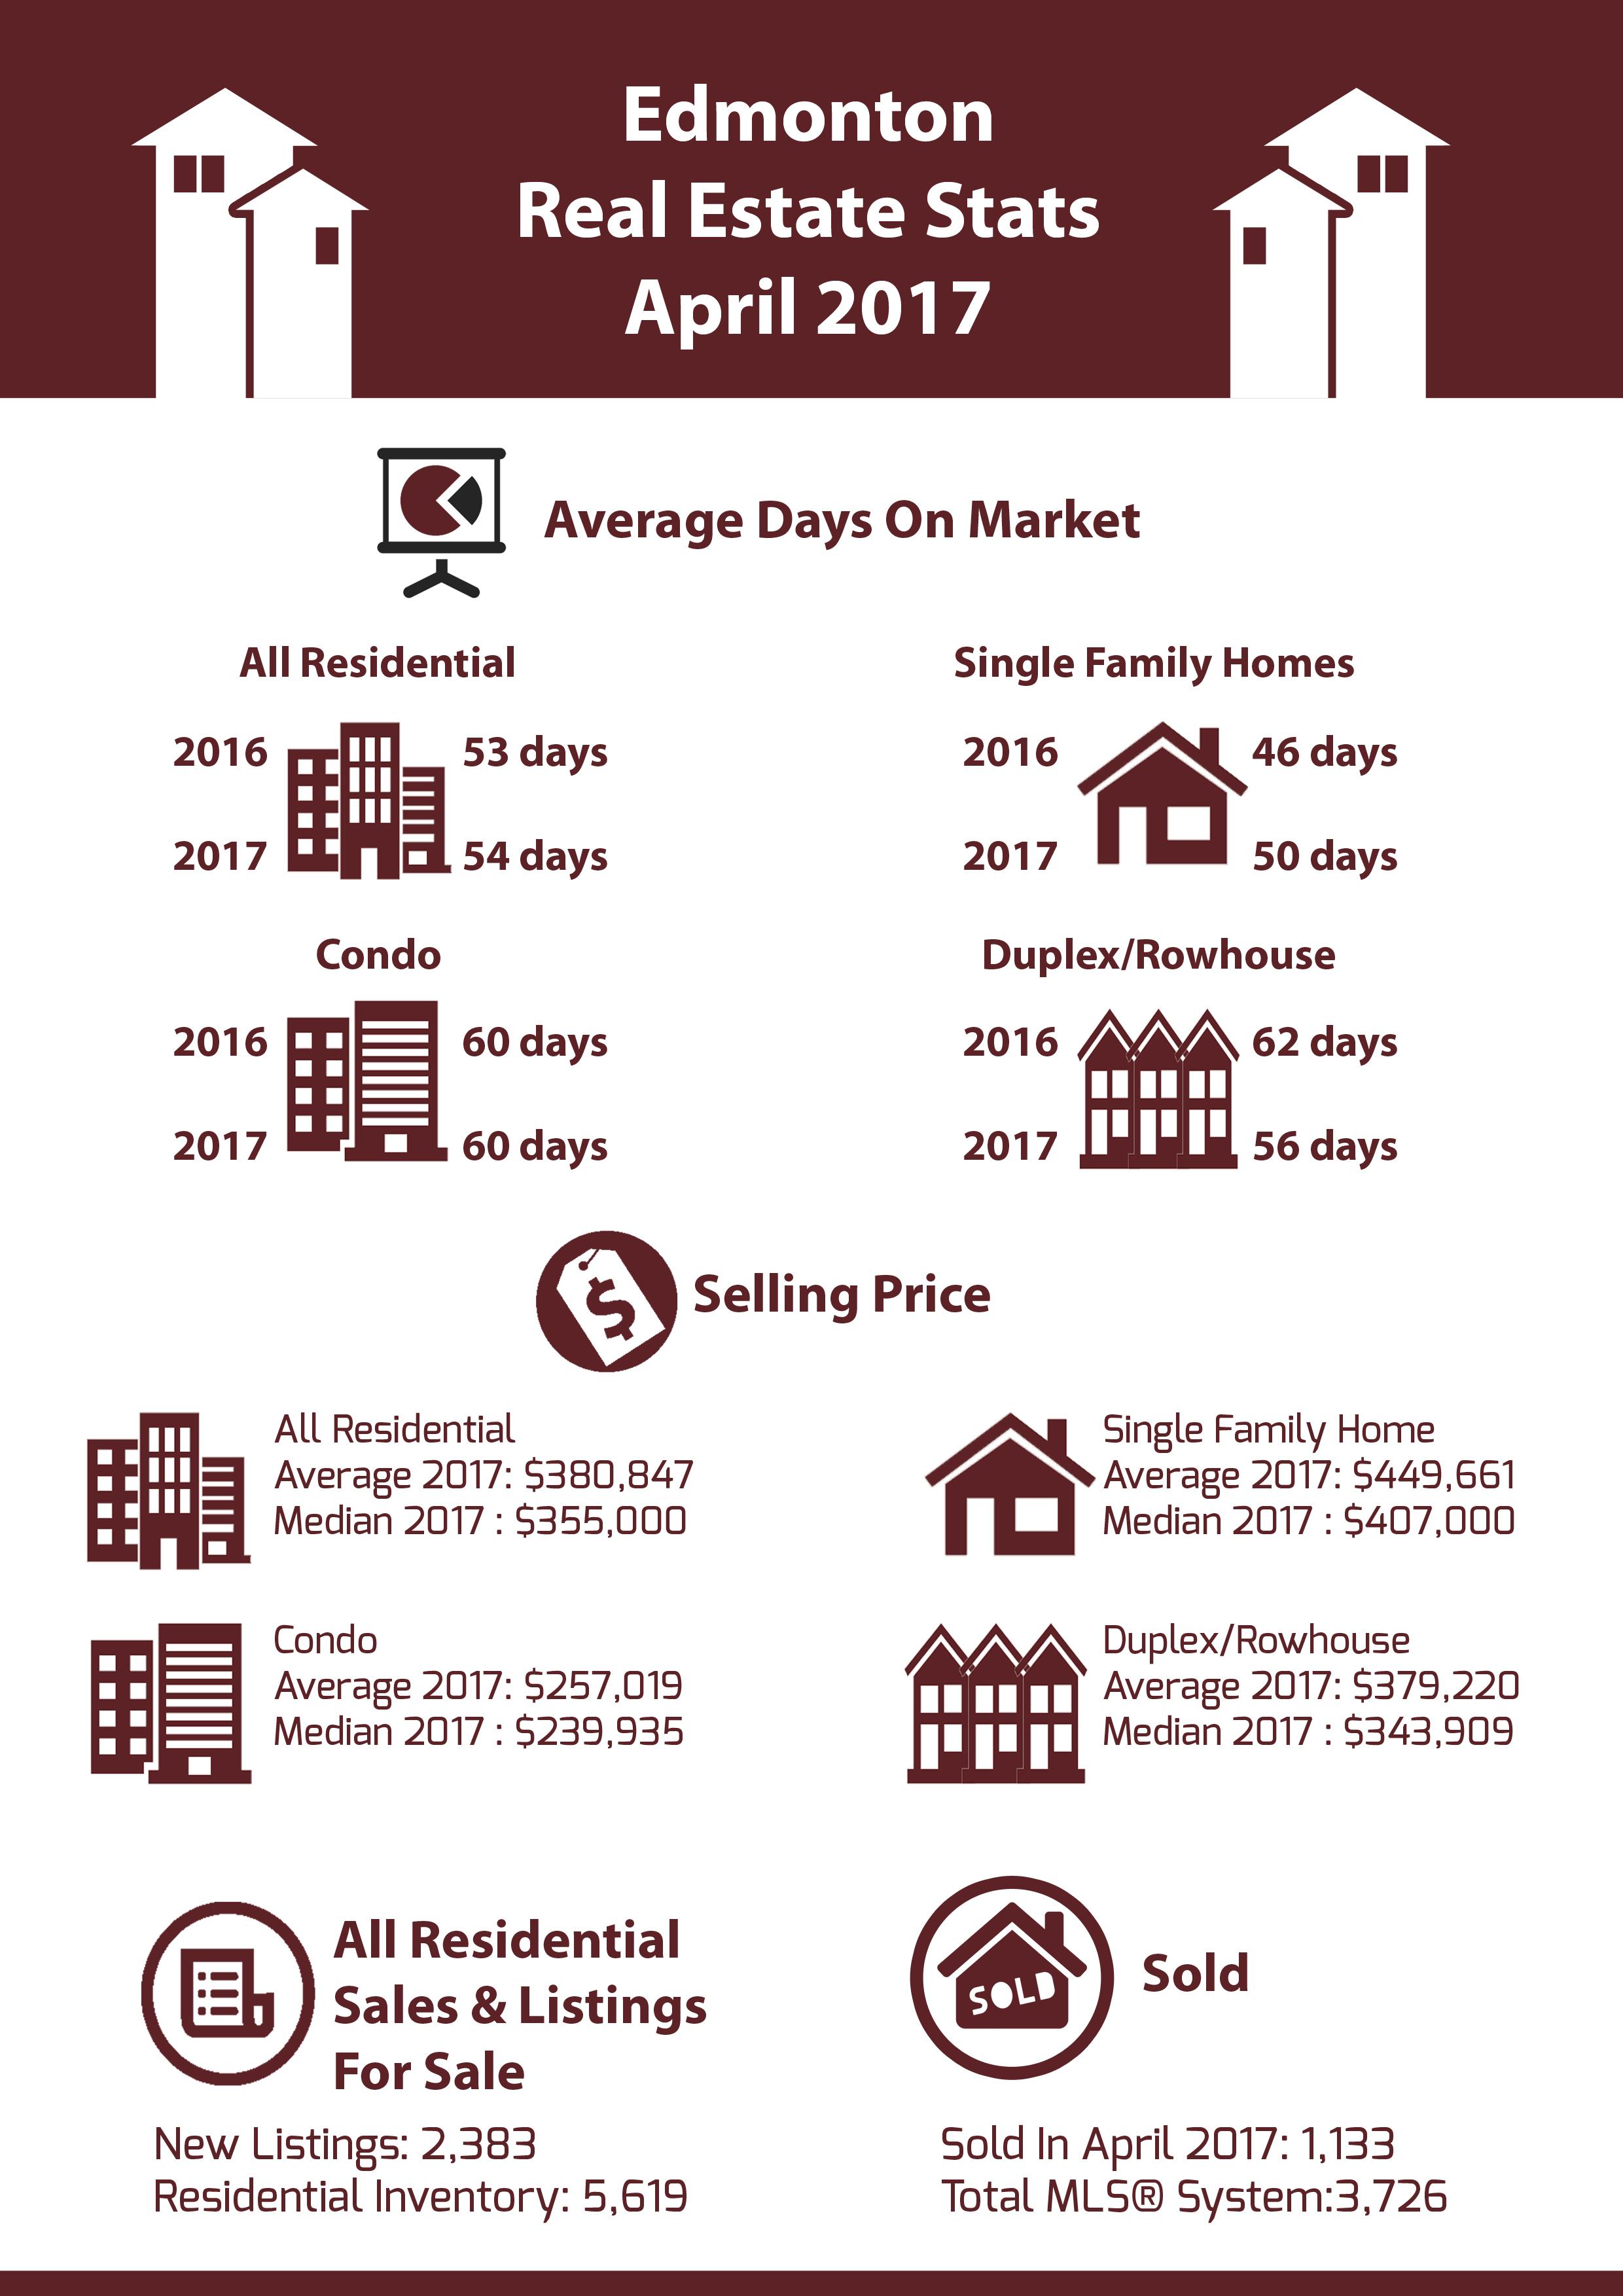 Edmonton Real Estate Stats April 2017